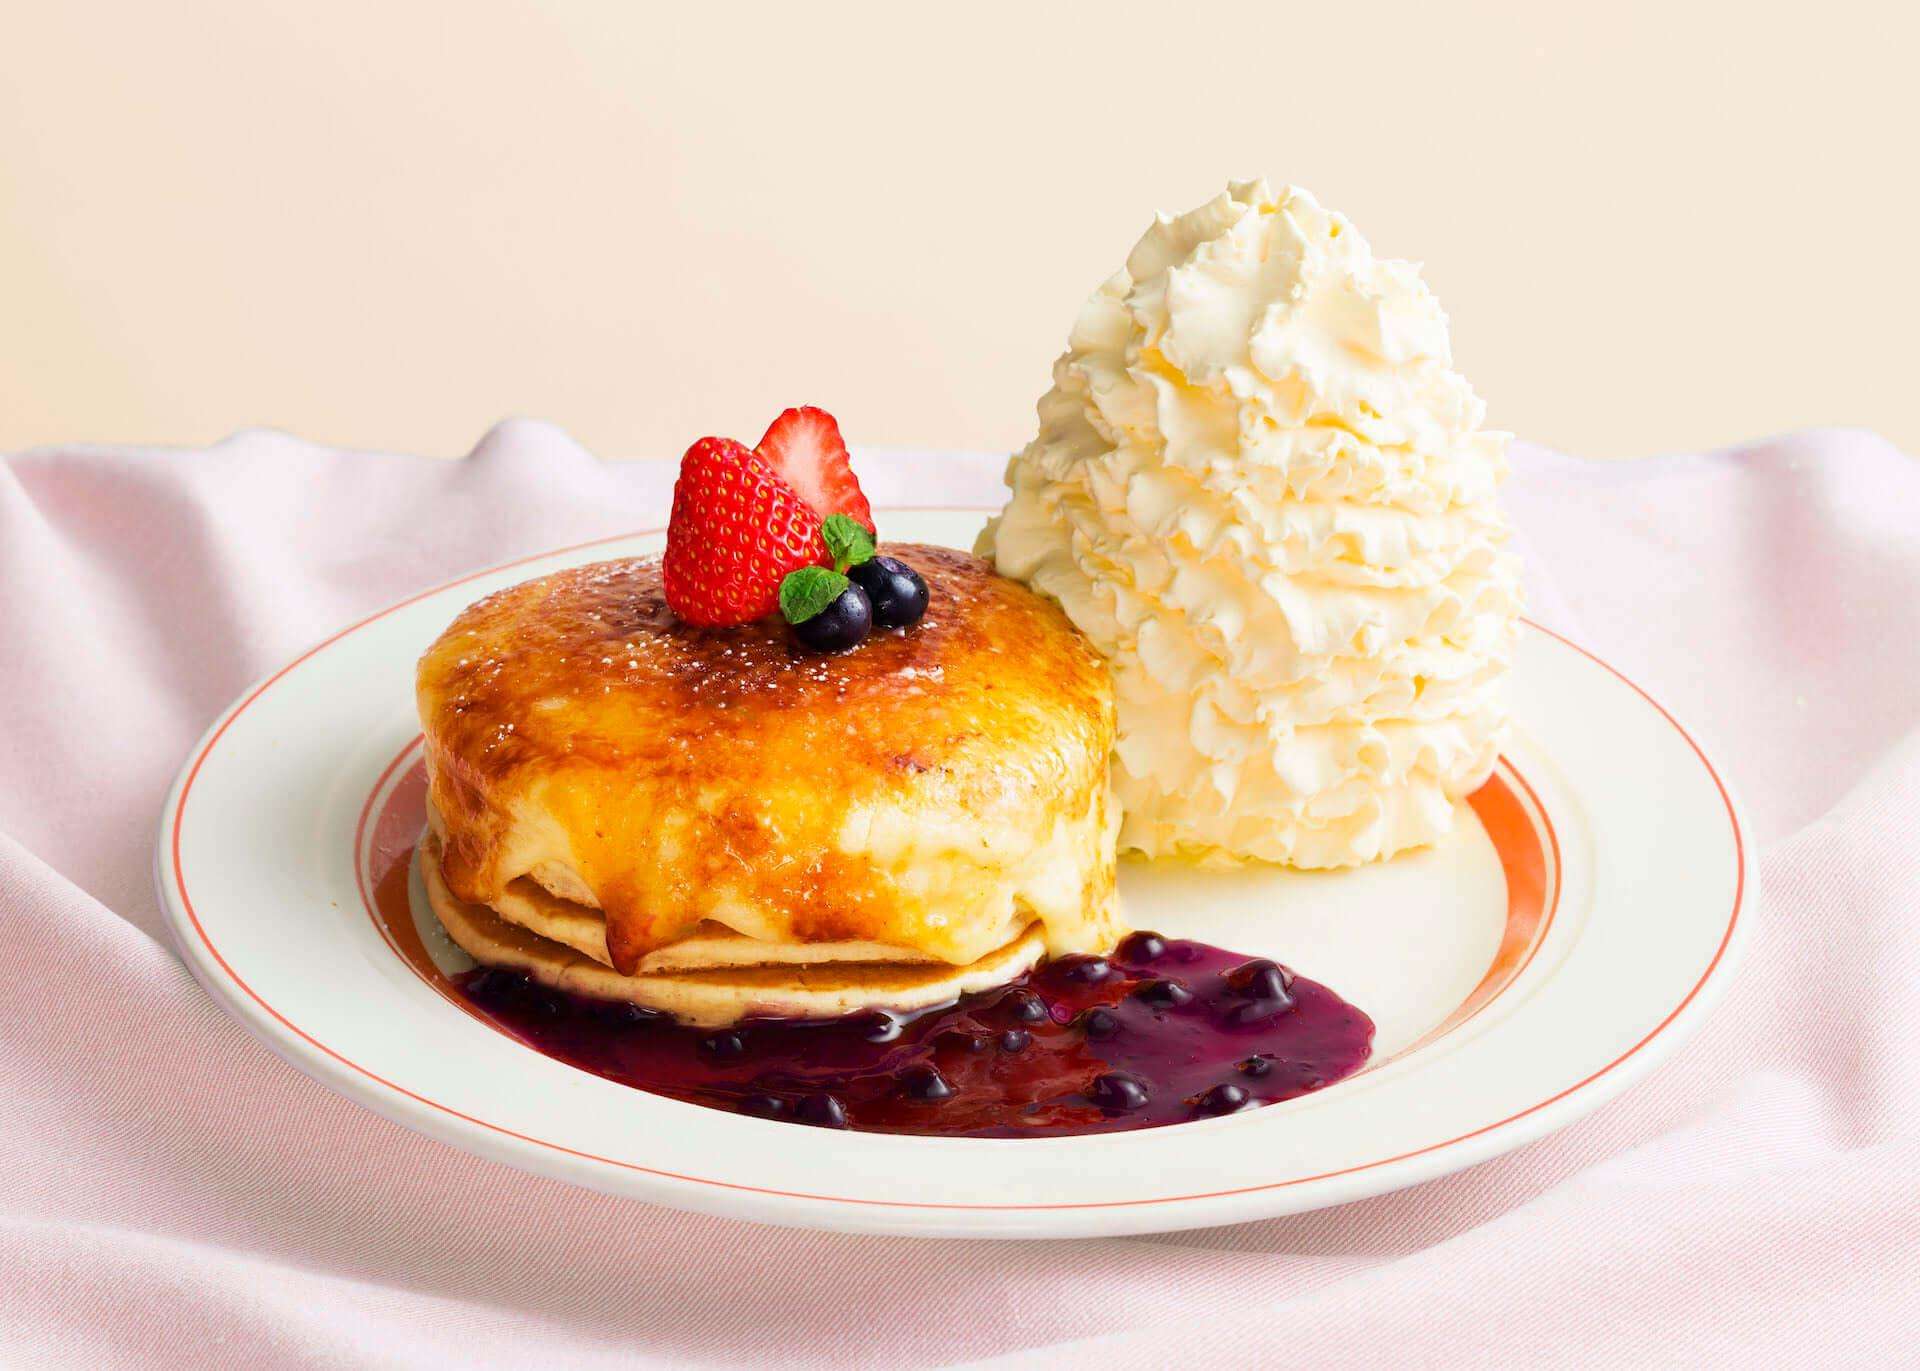 Eggs'n Thingsから、季節限定『クリームチーズのブリュレパンケーキ』『モッツァレラチーズとバジルチキンのホットサンド』が登場! gourmet200604_eggsnthings_01-1920x1371